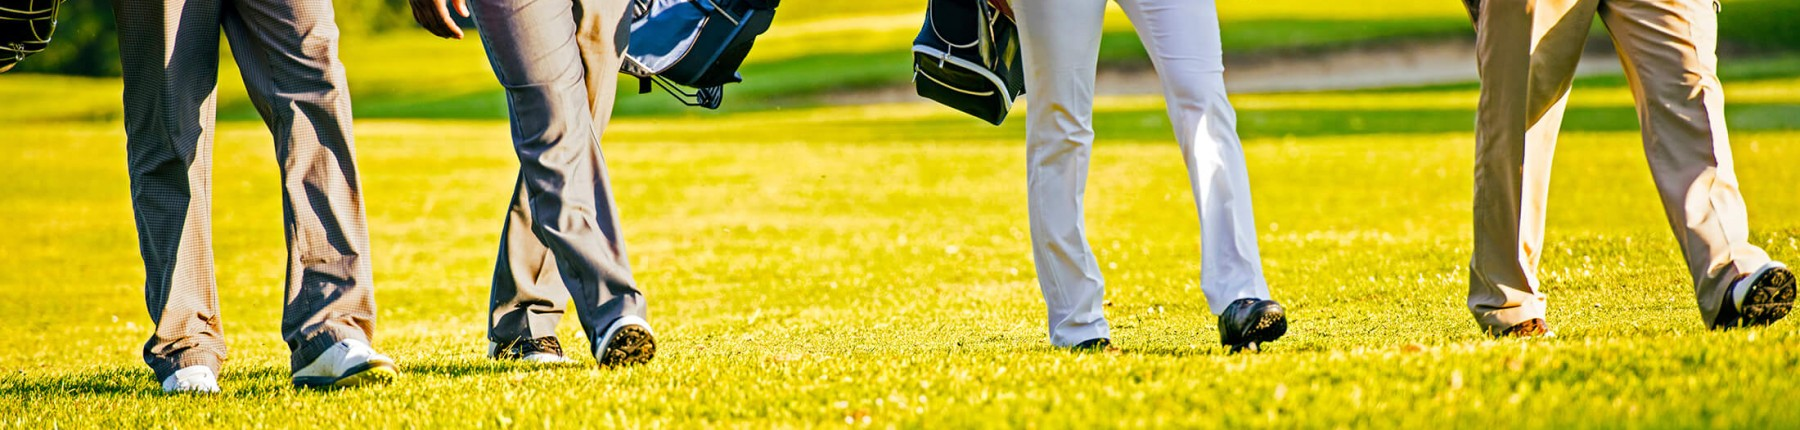 Group Golfing